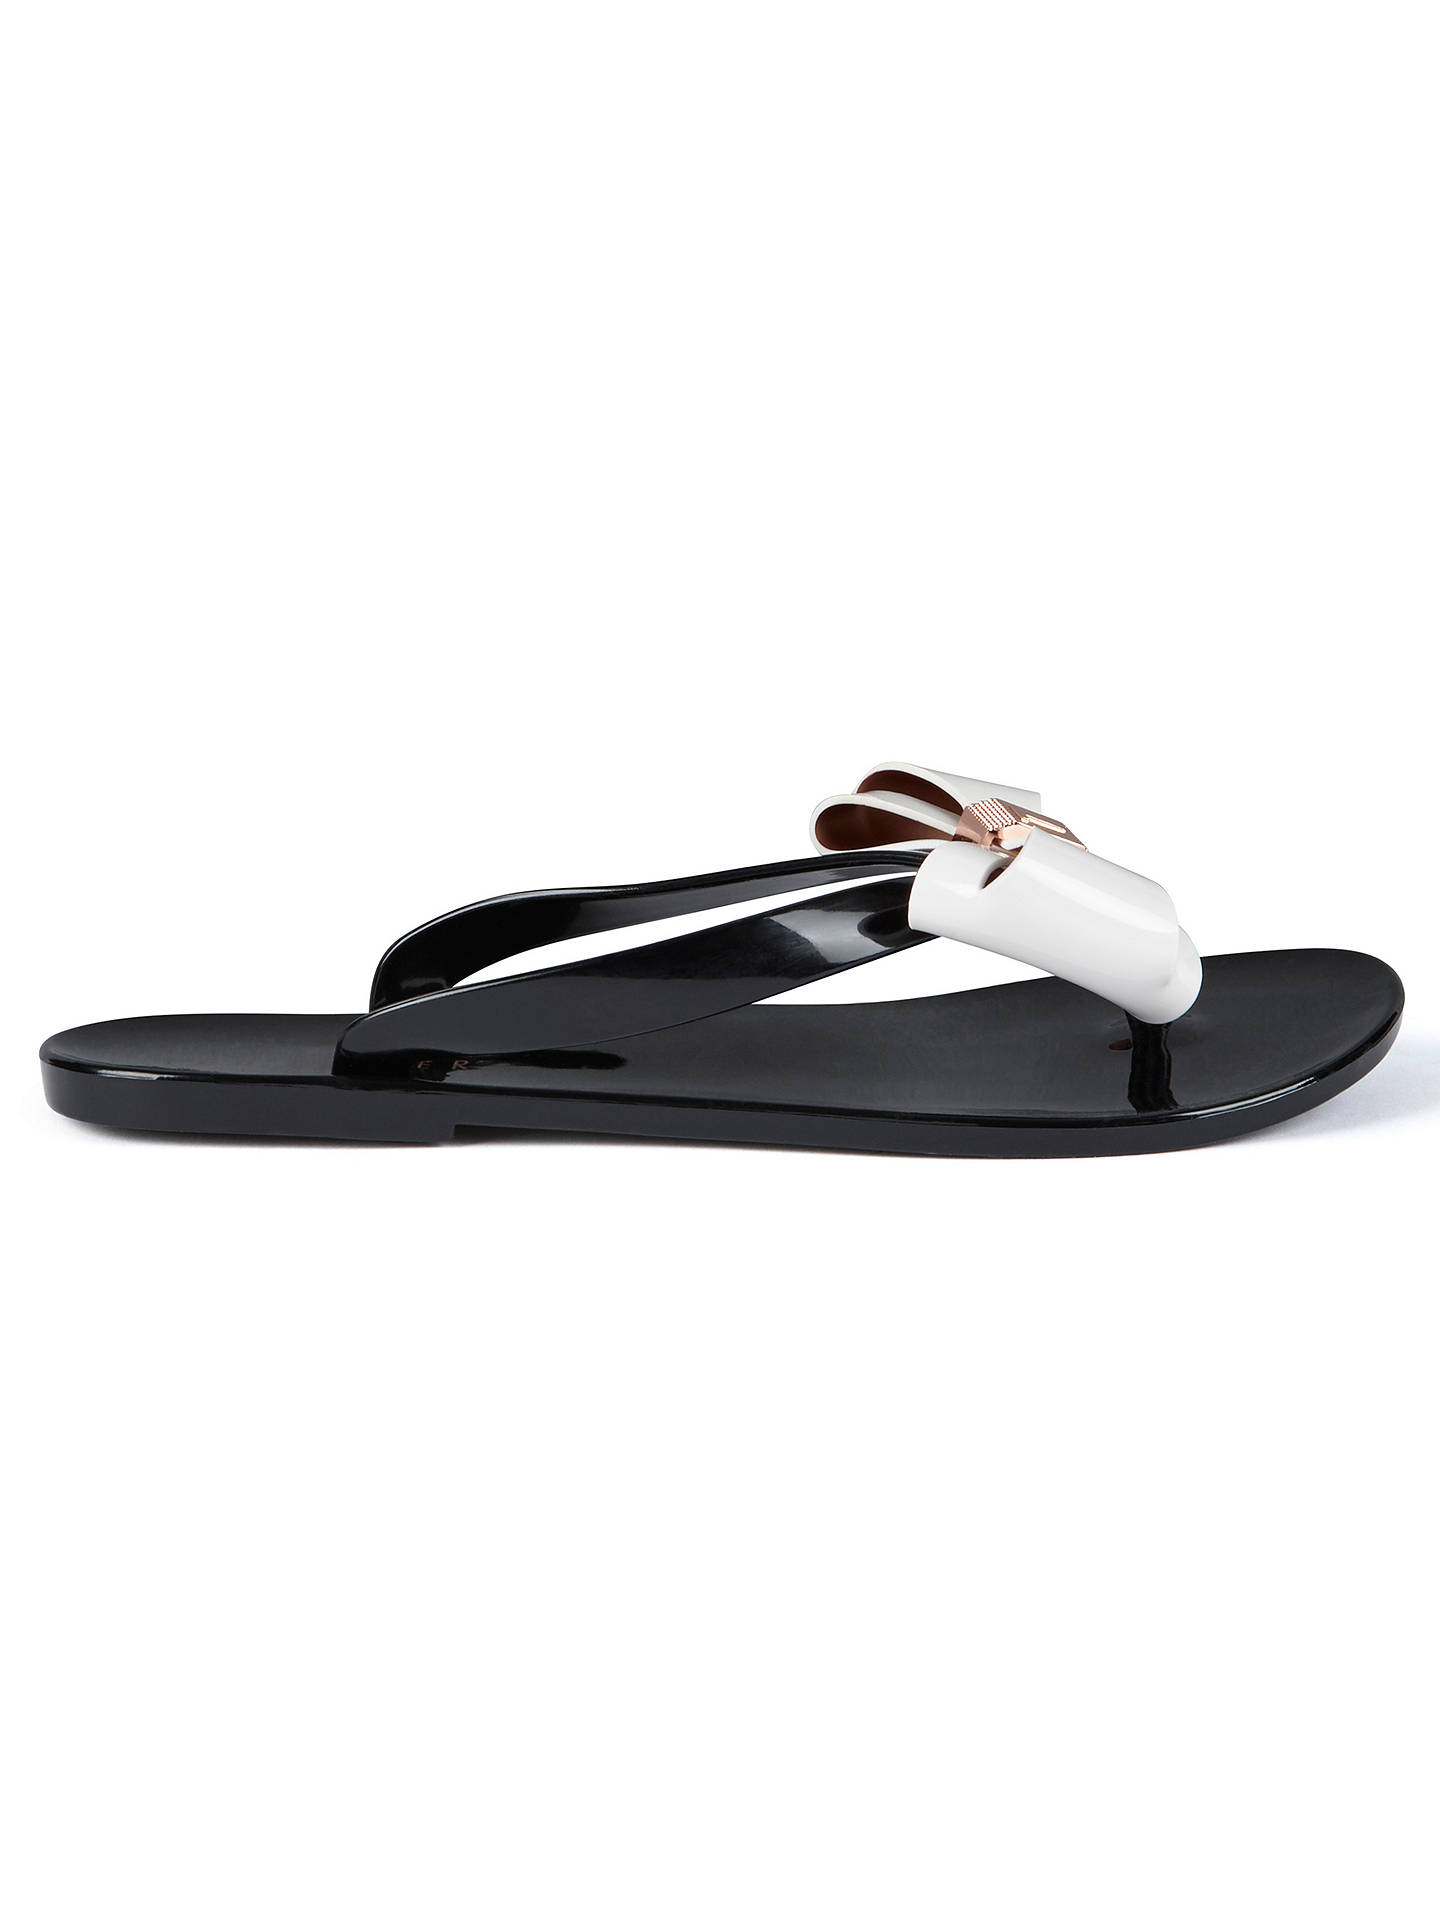 a728687c2 ... Buy Ted Baker Rafeek Bow Flip Flops